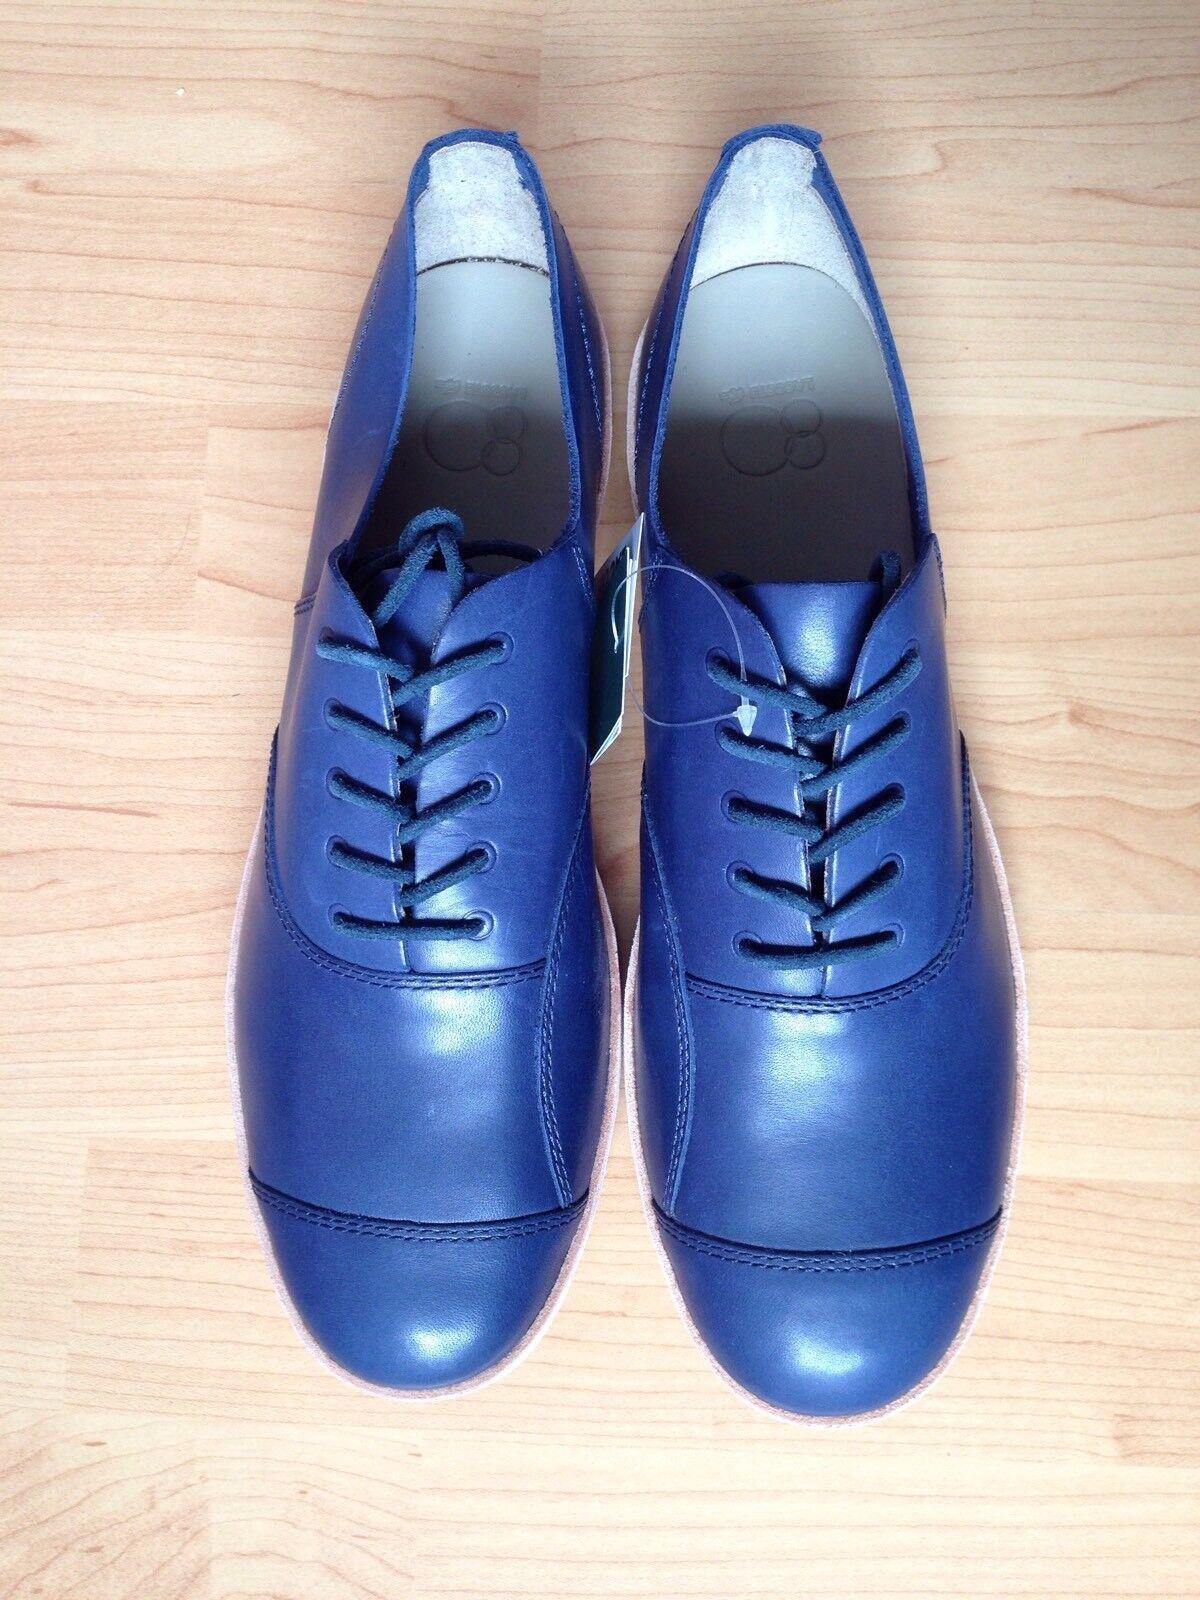 LACOSTE Schuhe Neu Sneakers Leder Blau Gr.42 Neu Schuhe c64c05